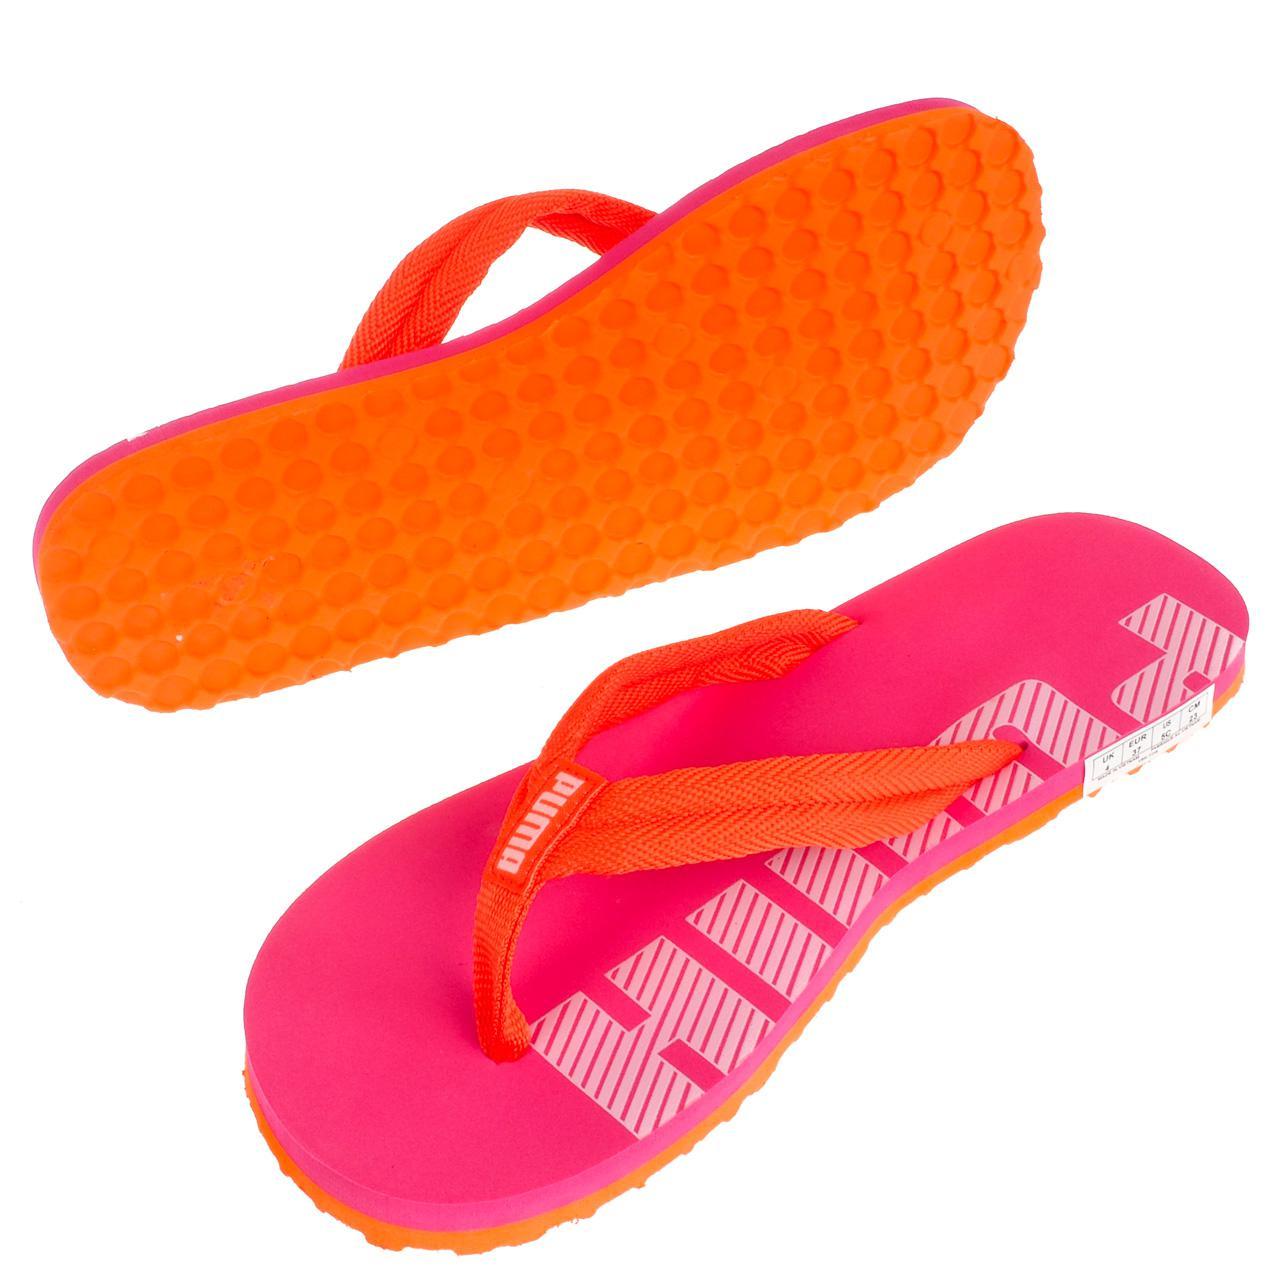 Latschen-Flip-Flops-Puma-Epic-Flip-v2-Rosa-Flip-Flops-Jr-Rosa-17067-Neu Indexbild 5